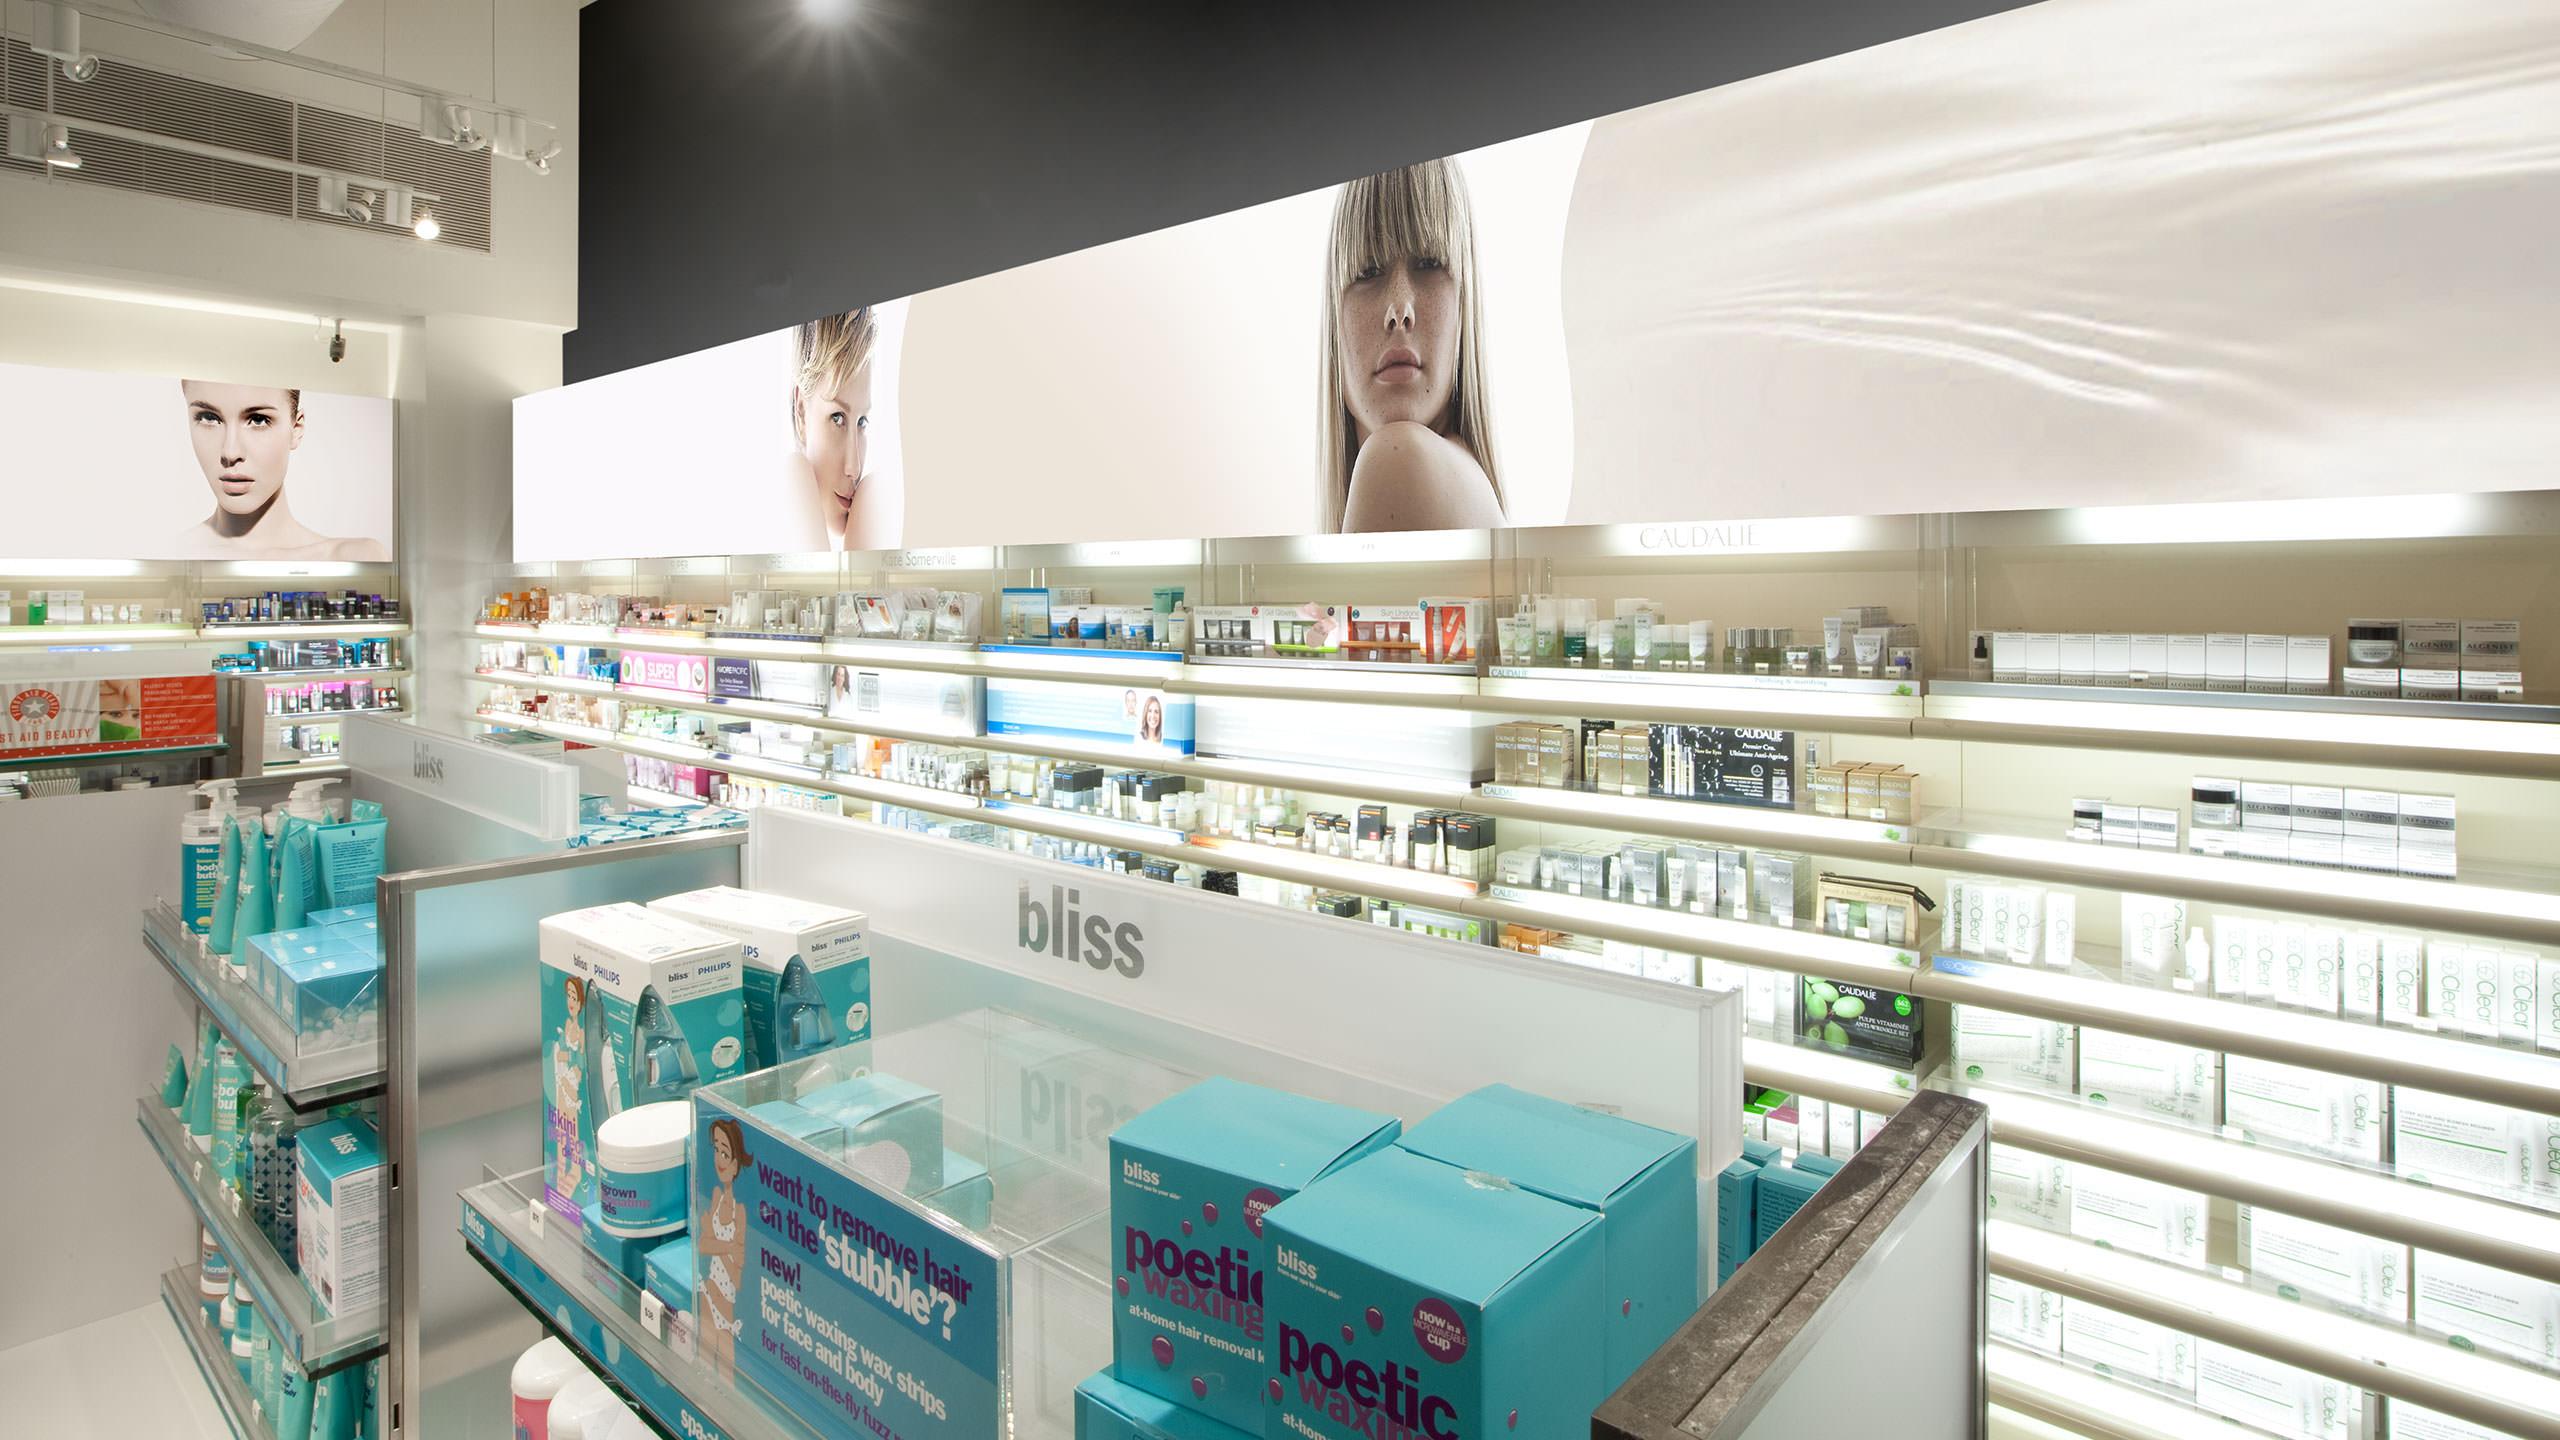 Sephora Retail Store - Interior space displaying skin care